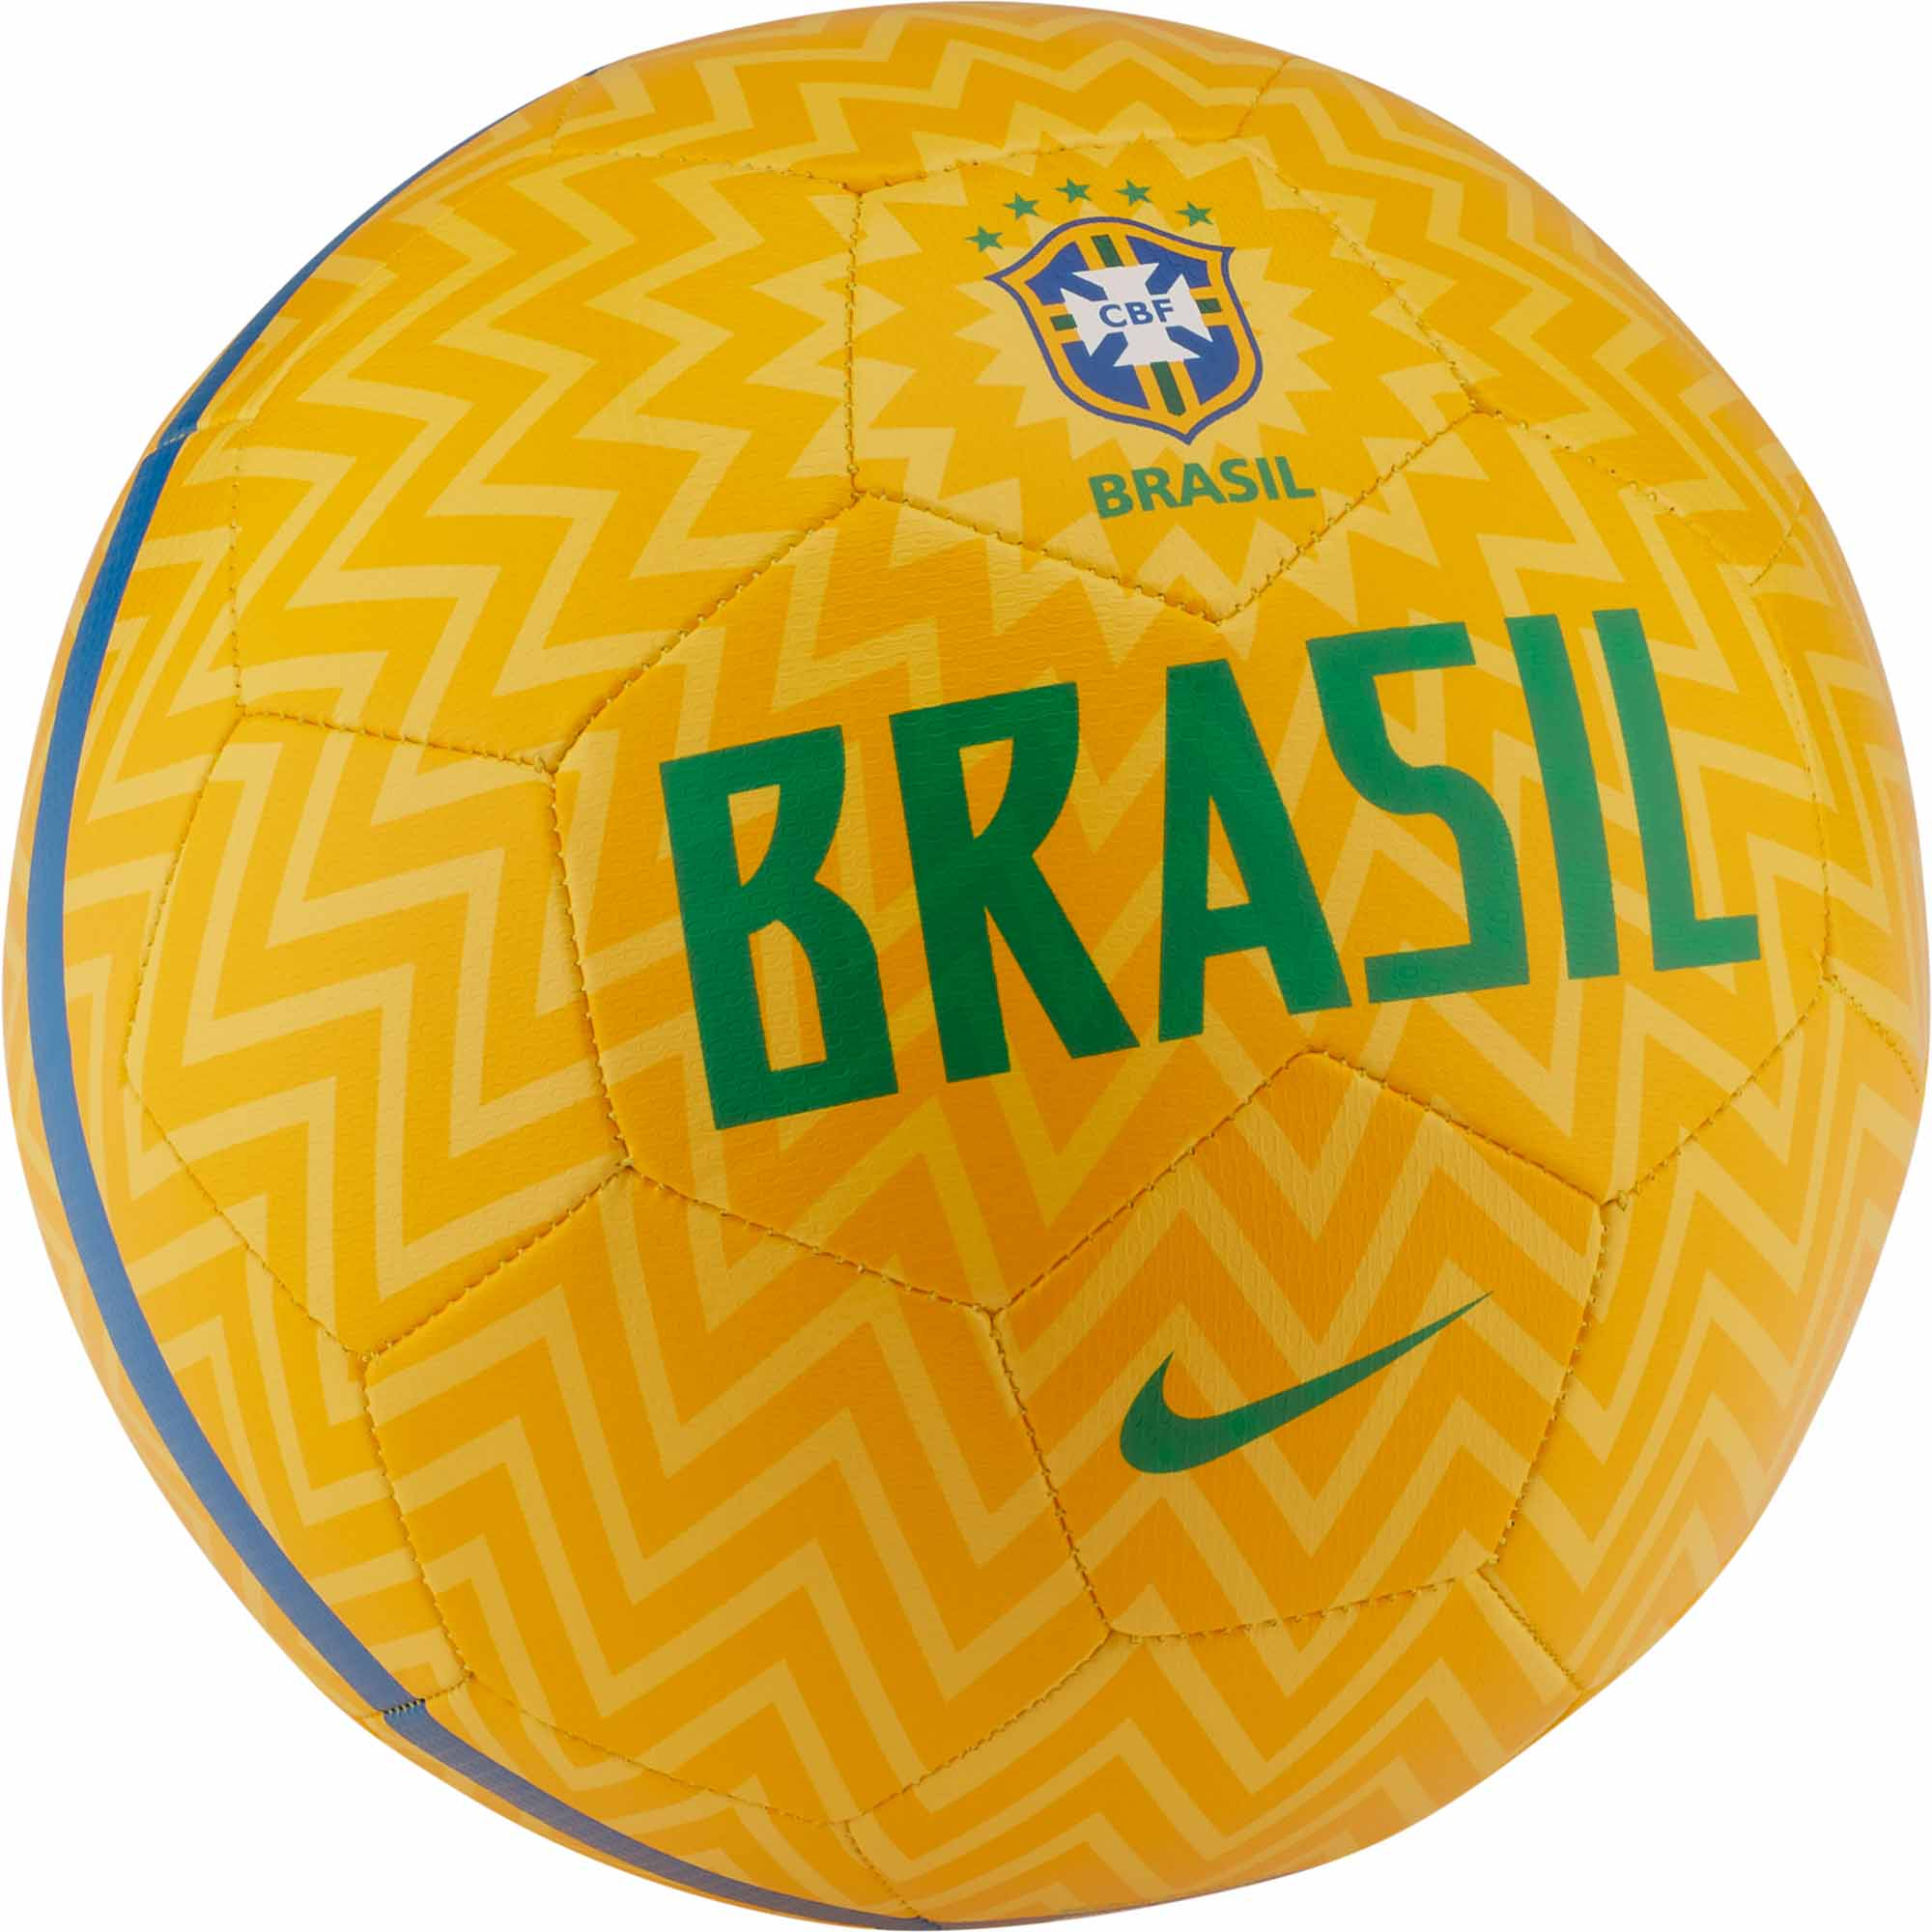 698d93336 Nike Brazil Prestige Soccer Ball - Gold/Lucky Green - SoccerPro.com